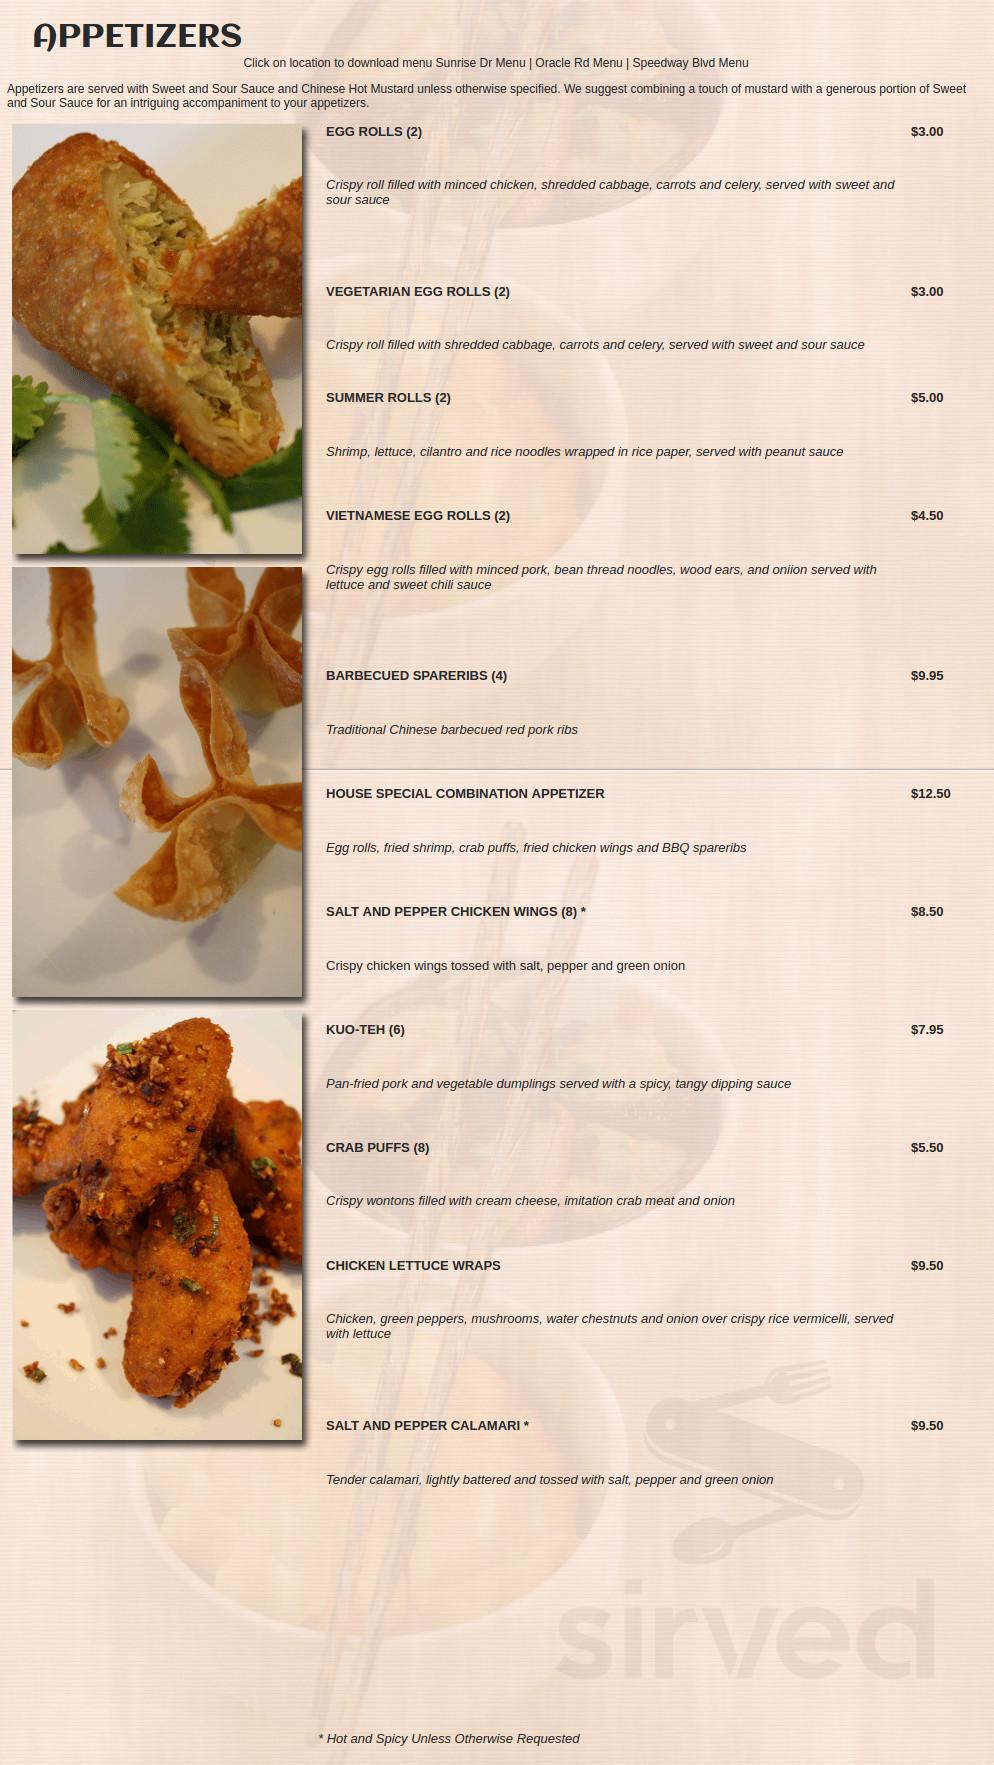 Golden dragon restaurant tucson menu british dragon pharmaceuticals andropen 275mg